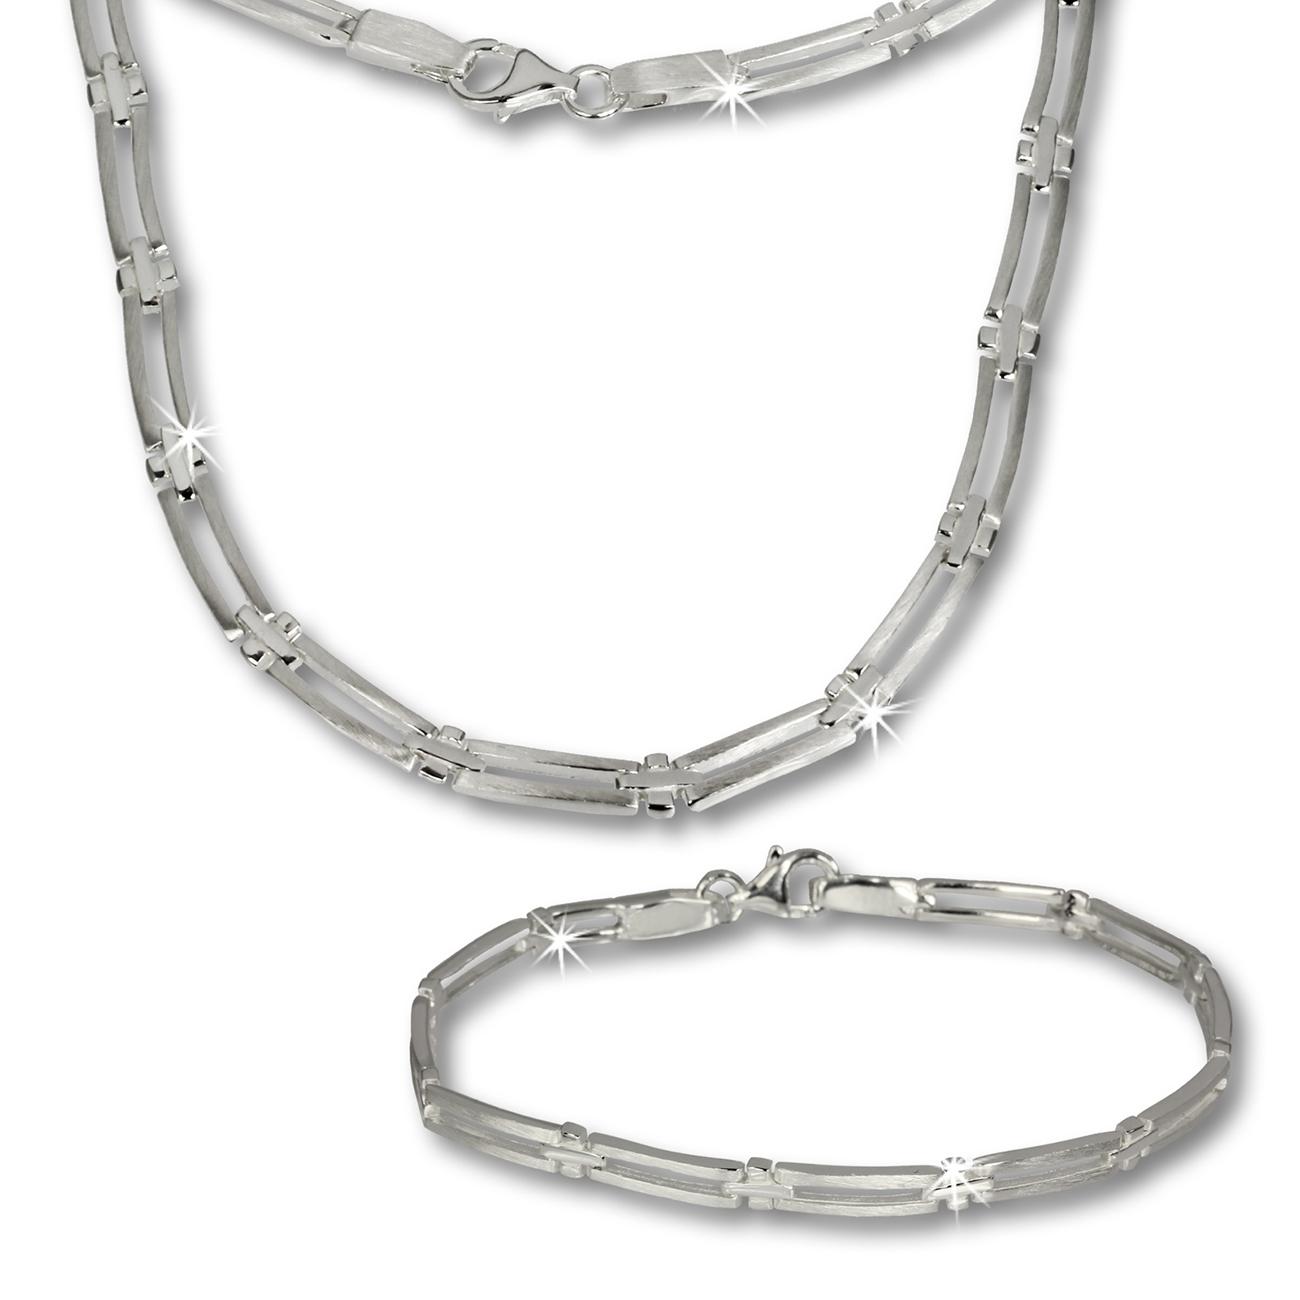 Schmuckset silber  SilberDream Schmuck Set Trendy Collier & Armband 925 Silber SDS407 ...